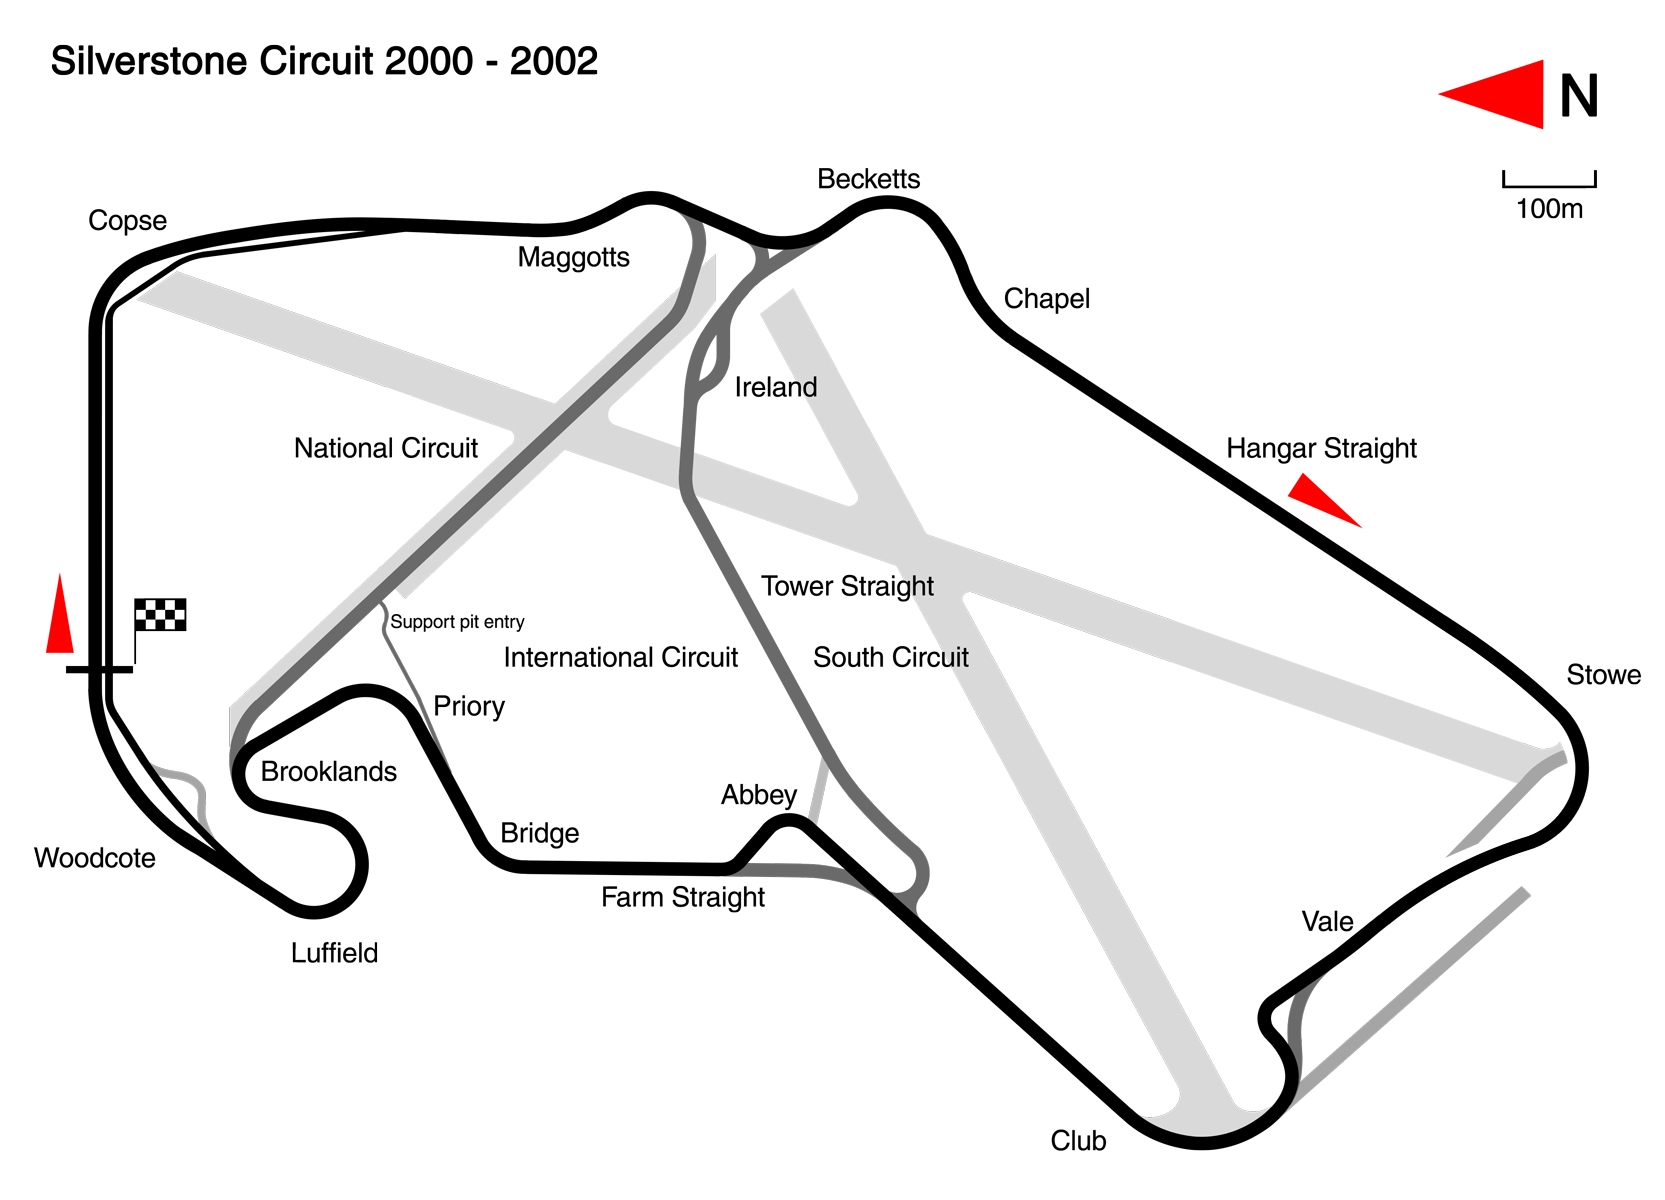 https://upload.wikimedia.org/wikipedia/commons/b/b2/Silverstone_Circuit_2000_to_2002.png